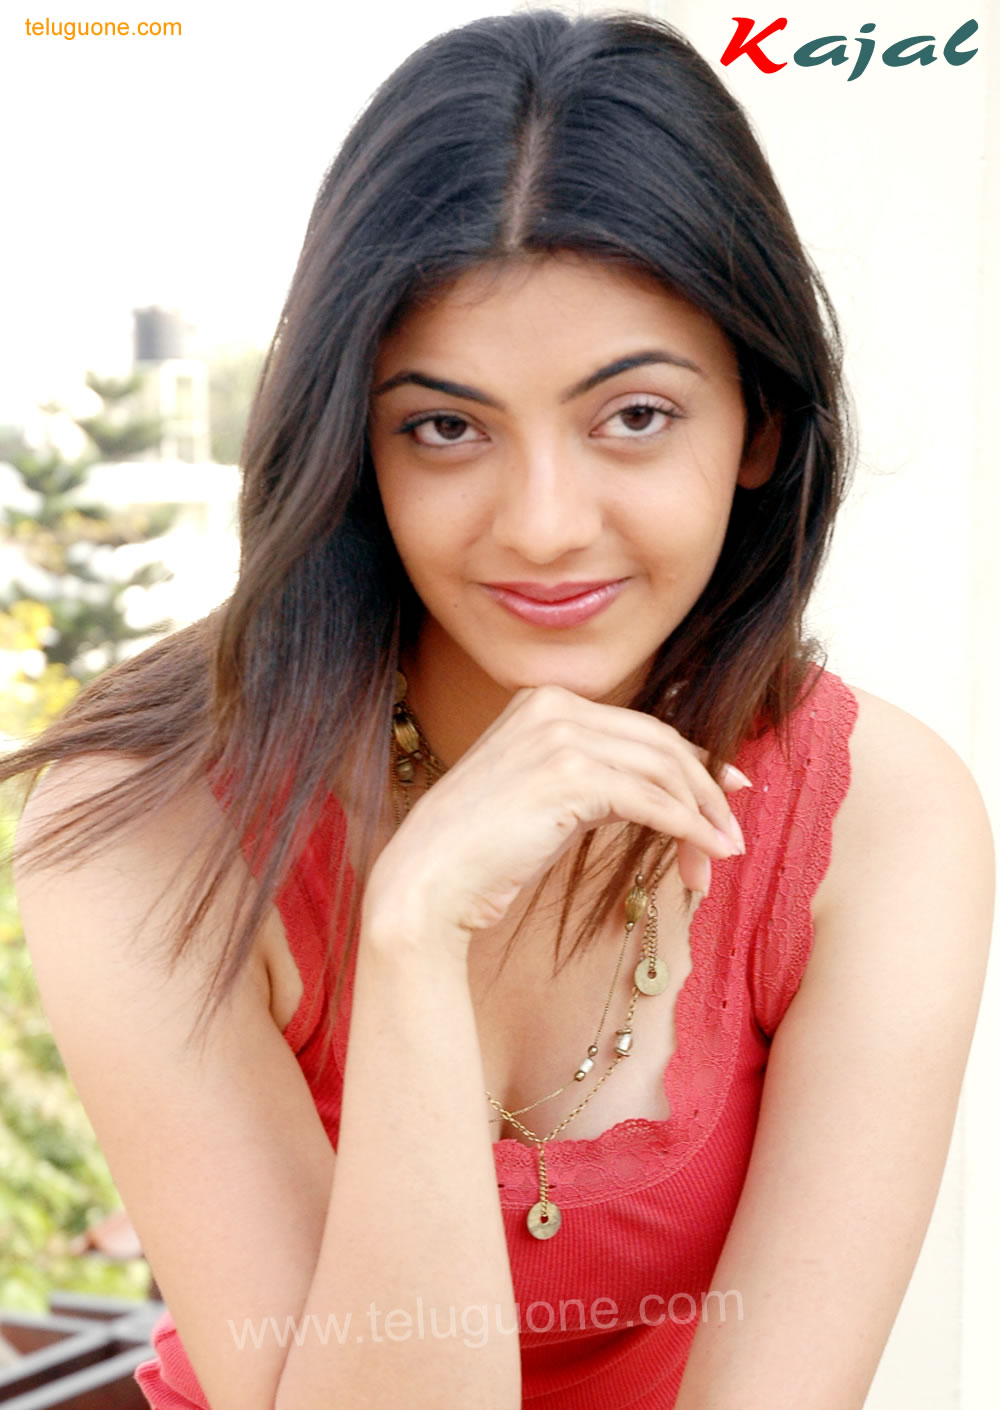 kajal hot pics | actor movies